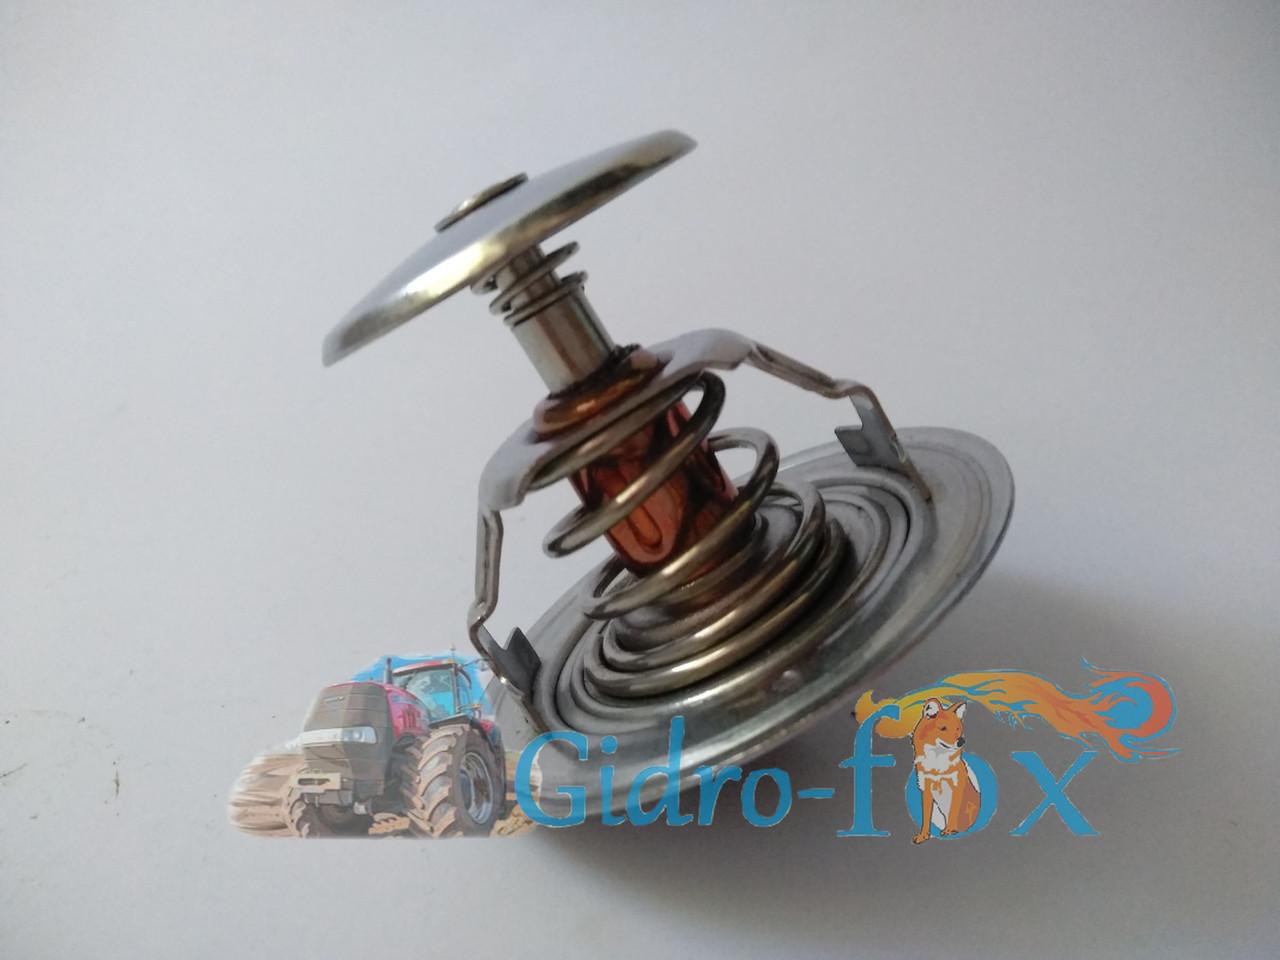 Термостат МТЗ (МС-117) ст. зразка Кт.Н. ТЗ-117-04